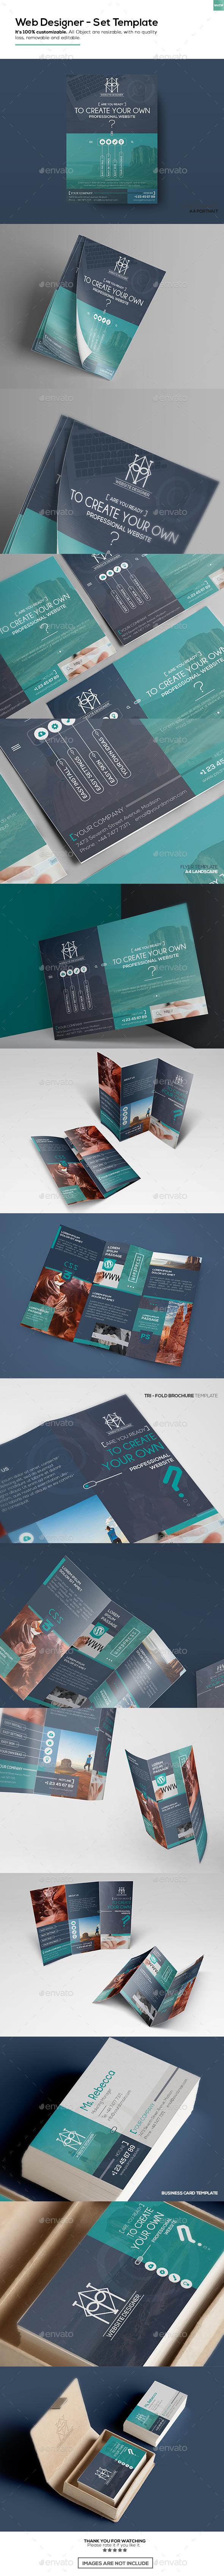 Web Designer – Set Template - Portfolio Brochures